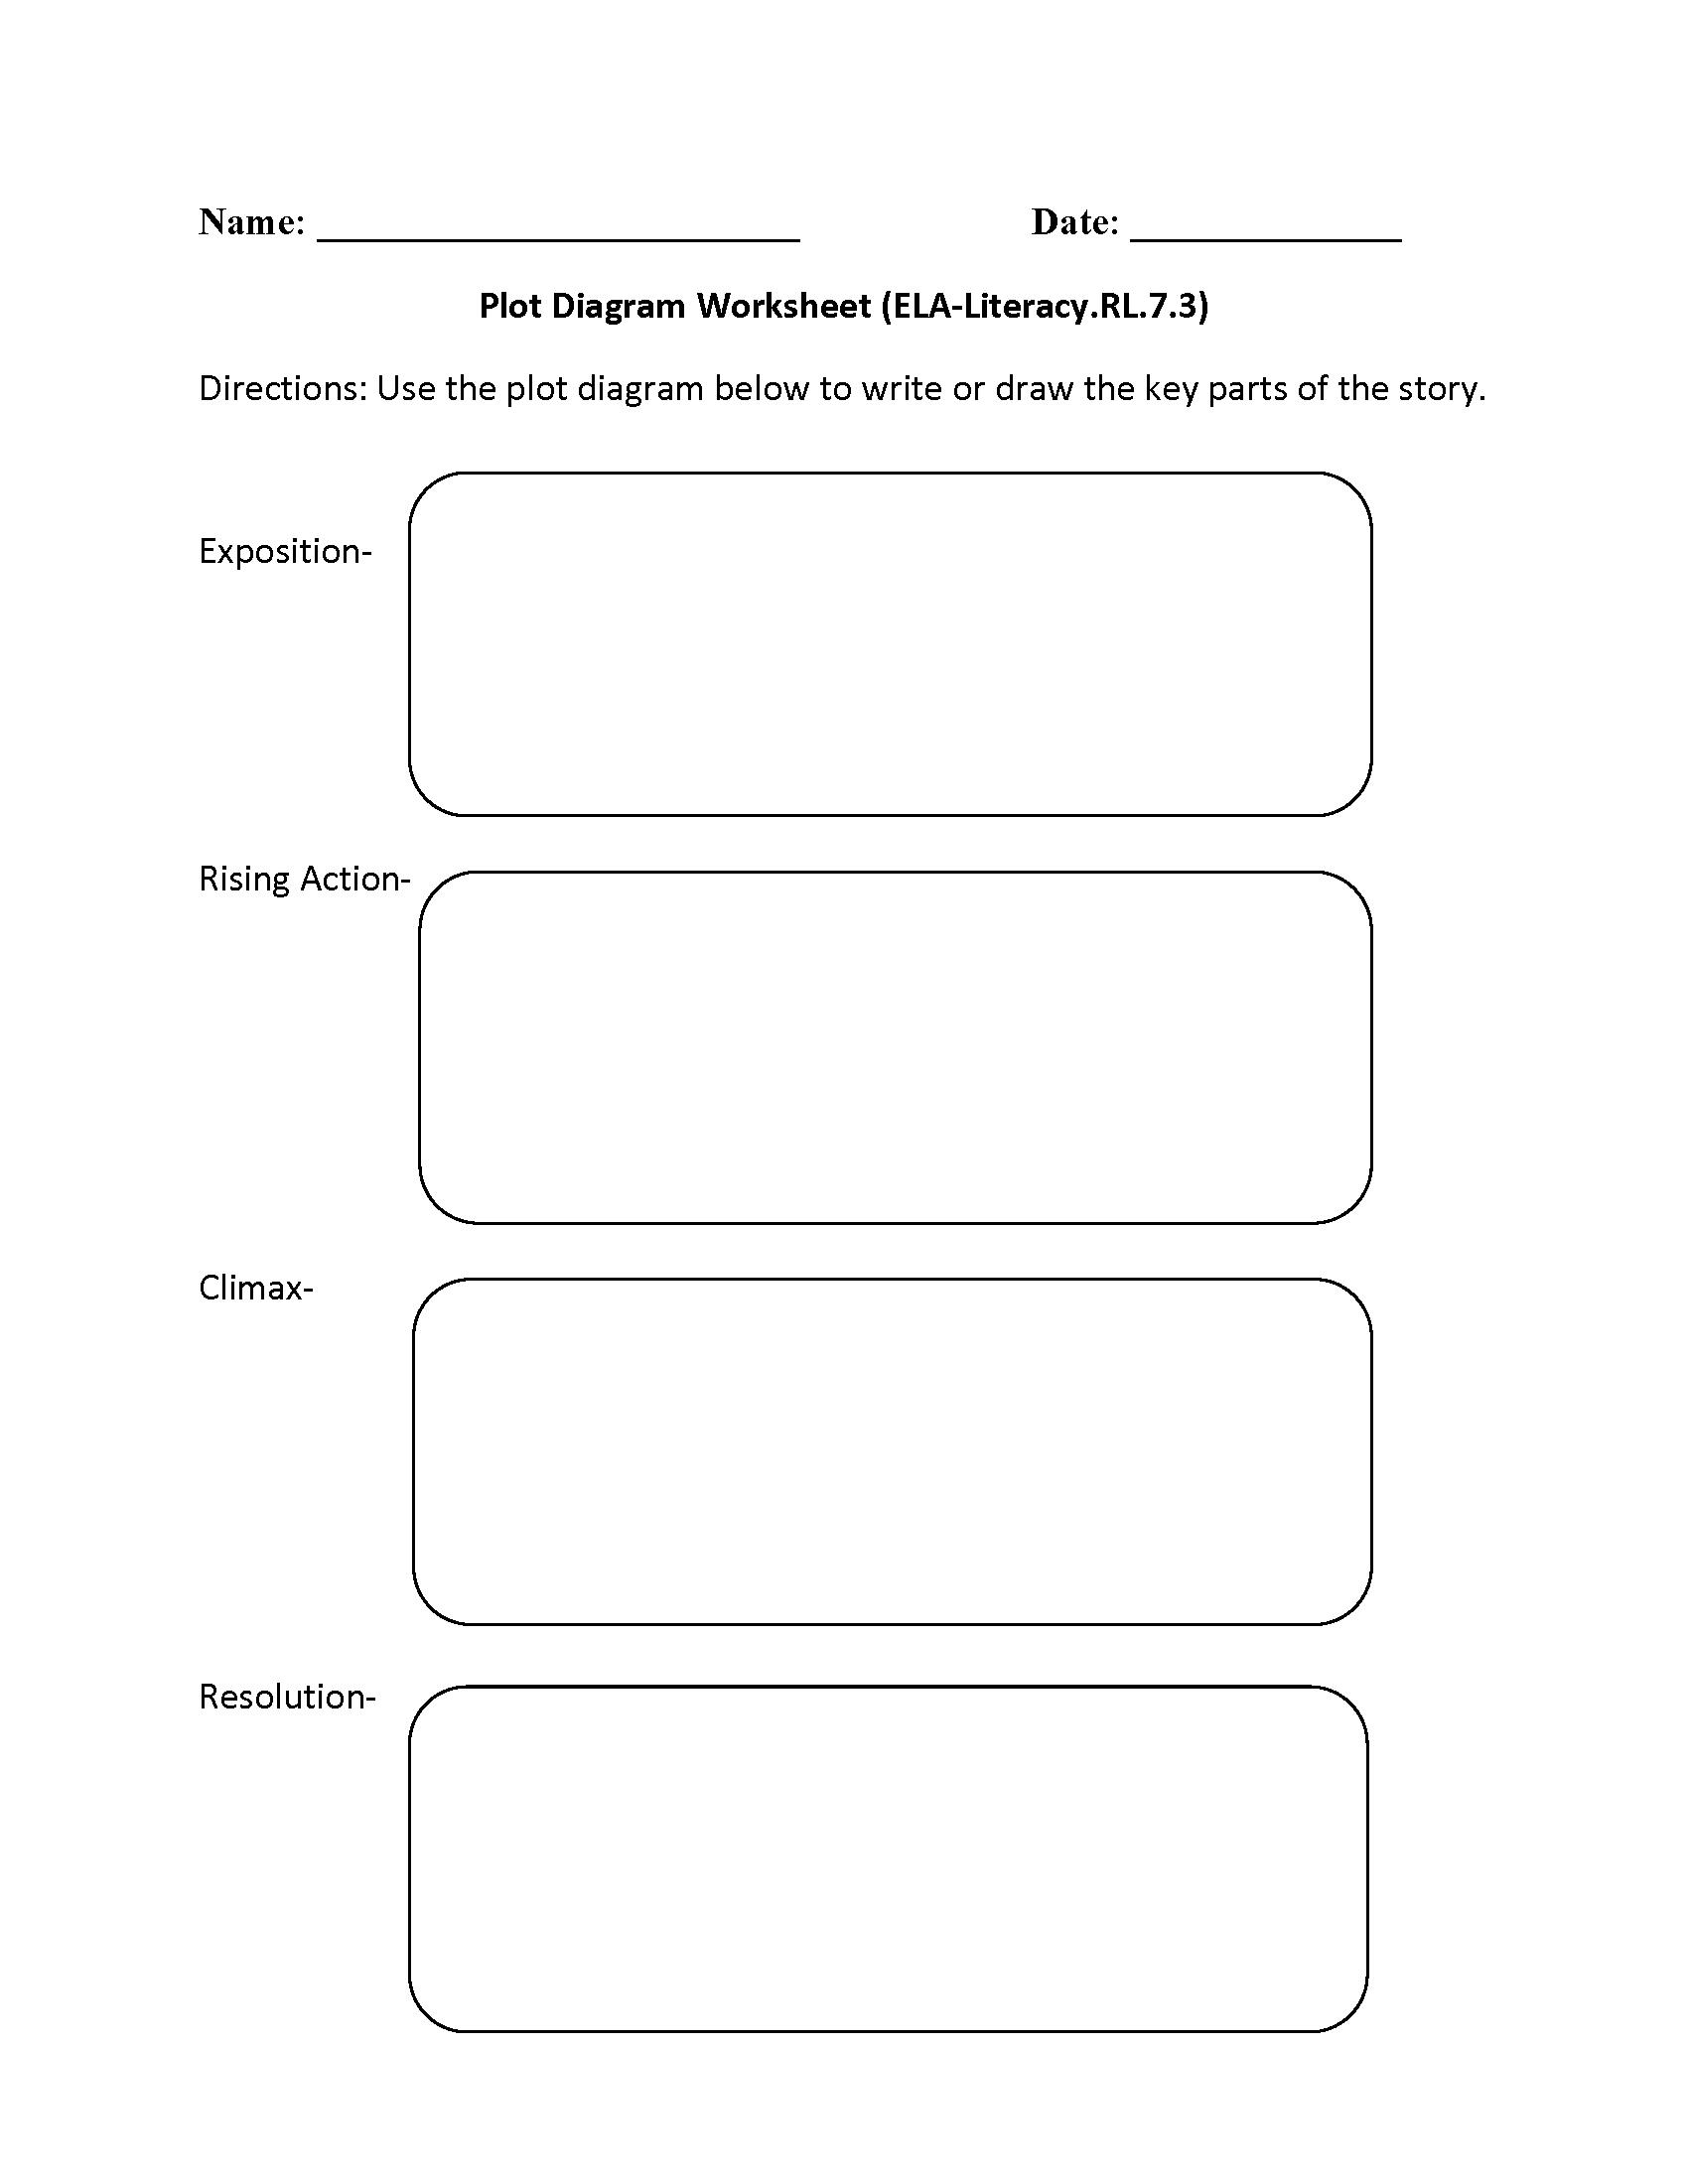 Plot Diagram ELA-Literacy.RL.7.3 Reading Literature Worksheet   Reading  literature [ 2200 x 1700 Pixel ]